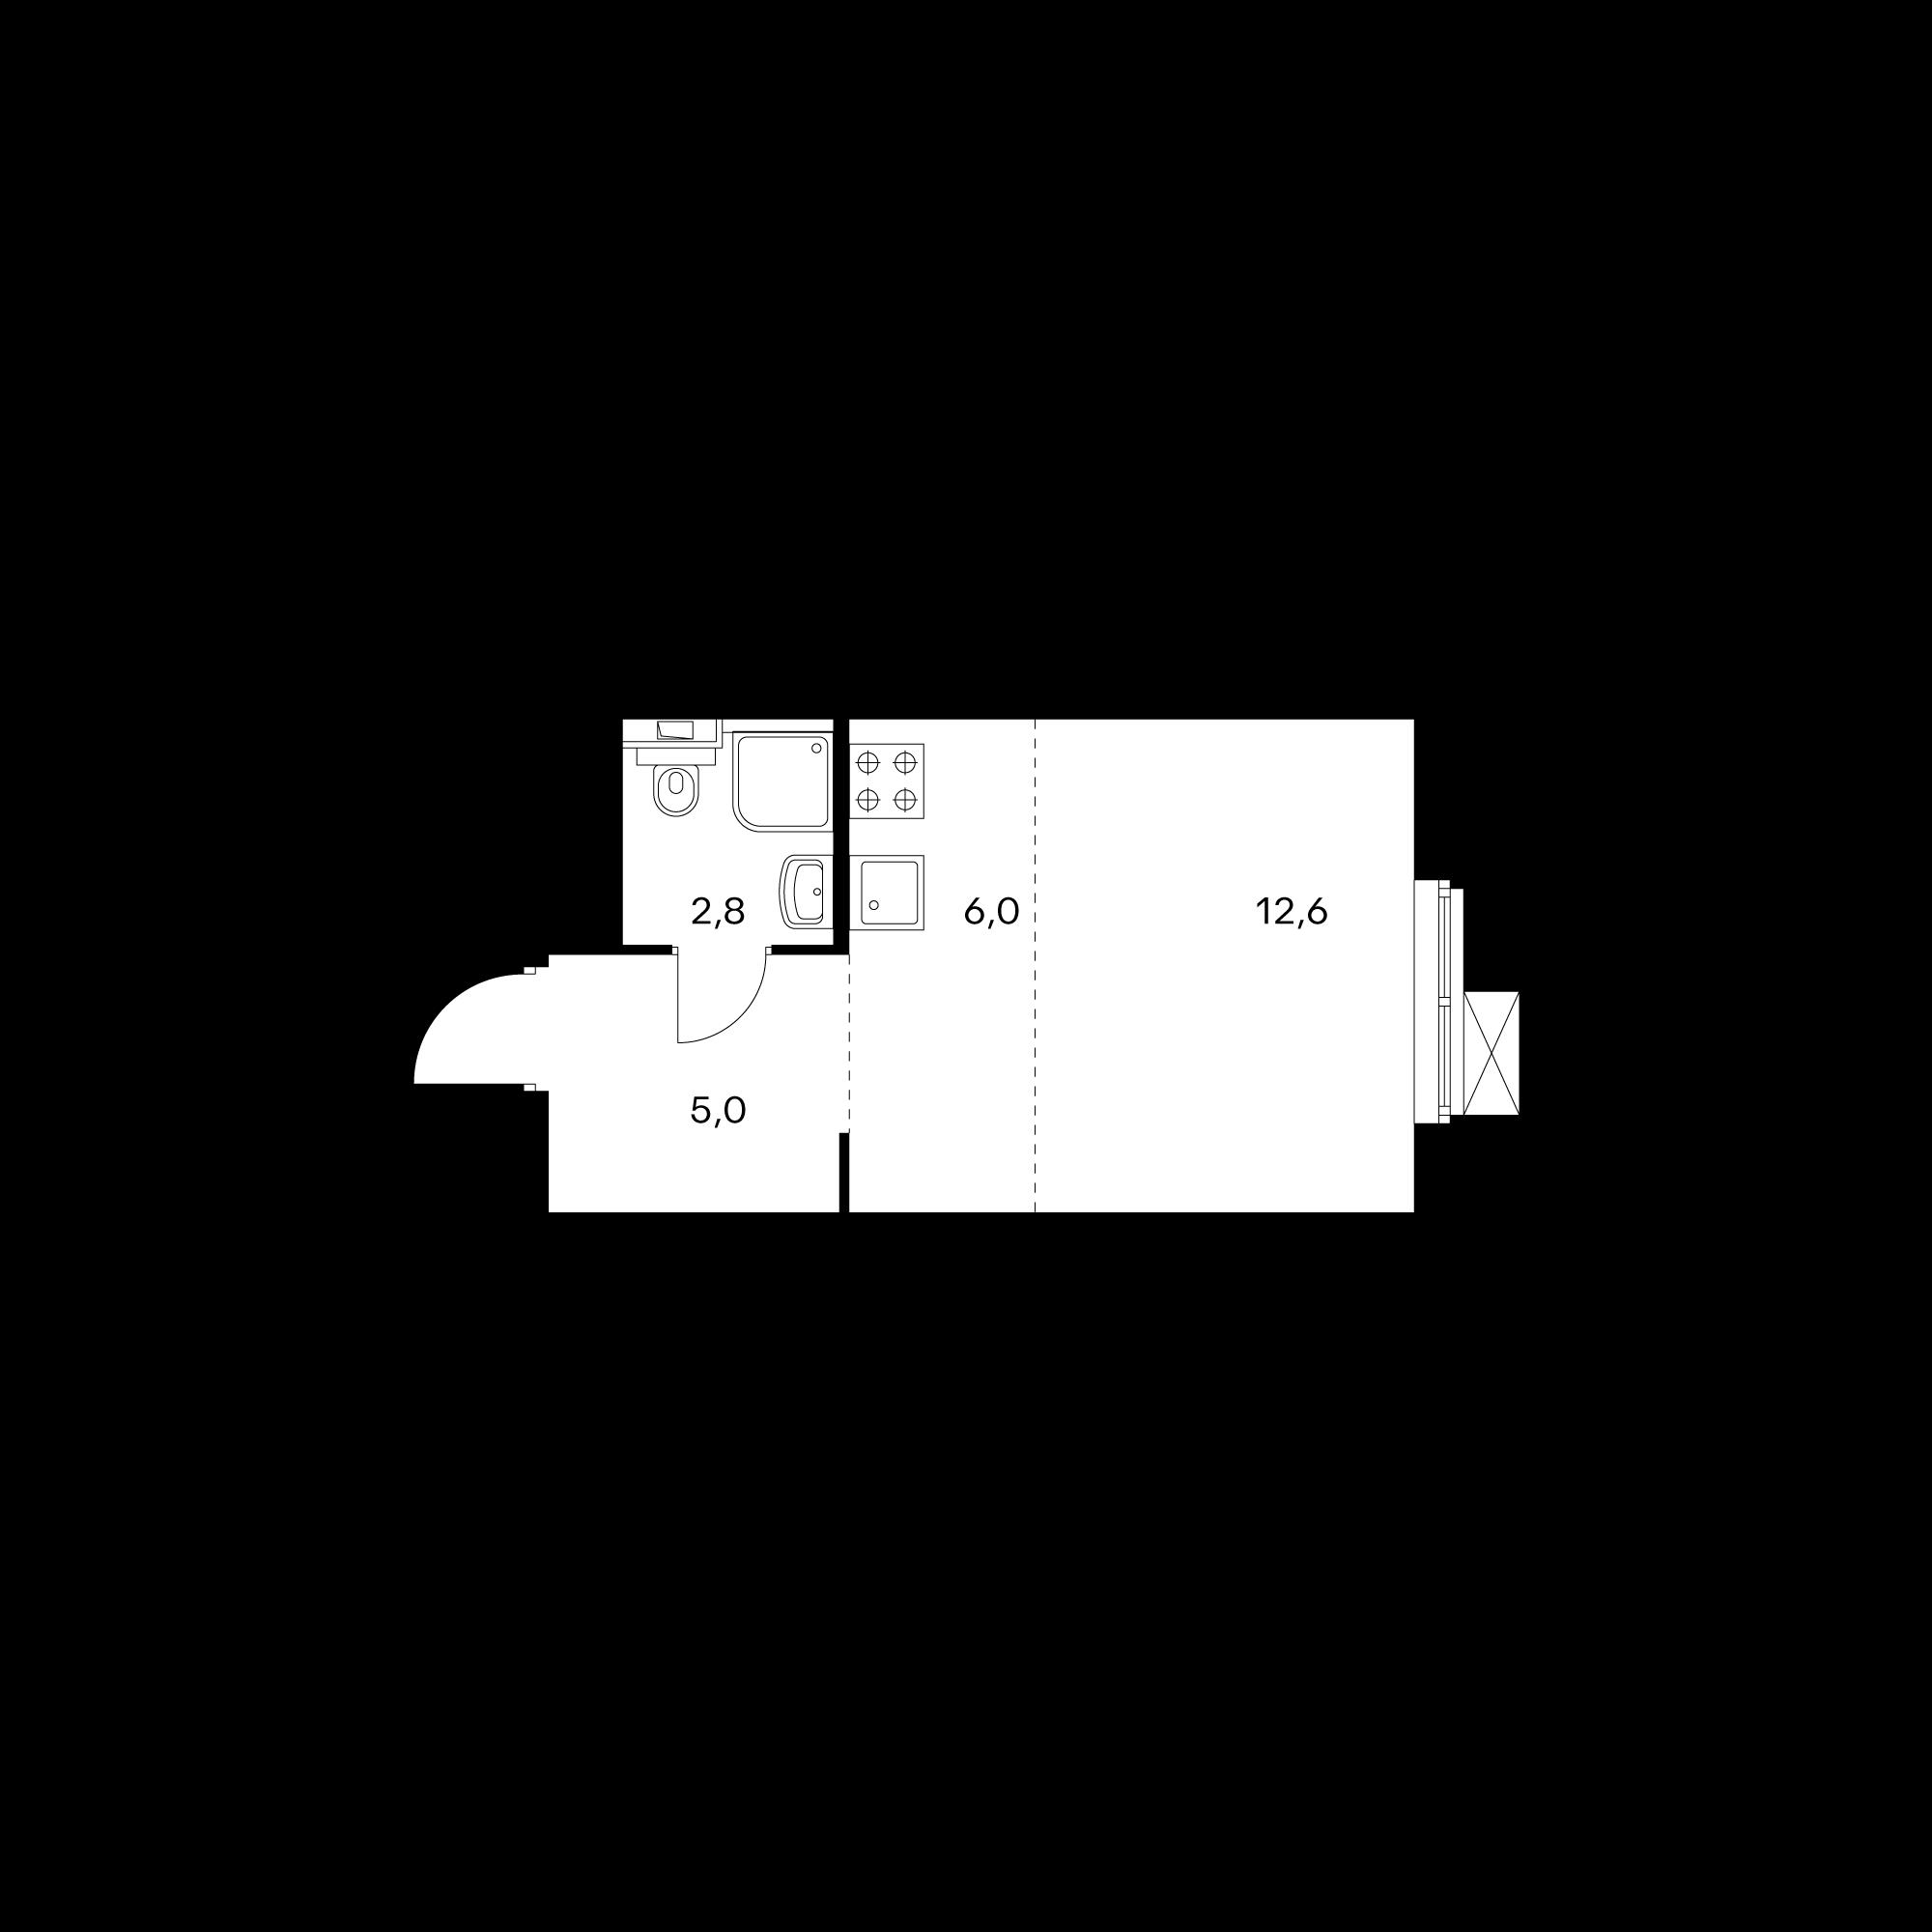 1NM1-2_Z